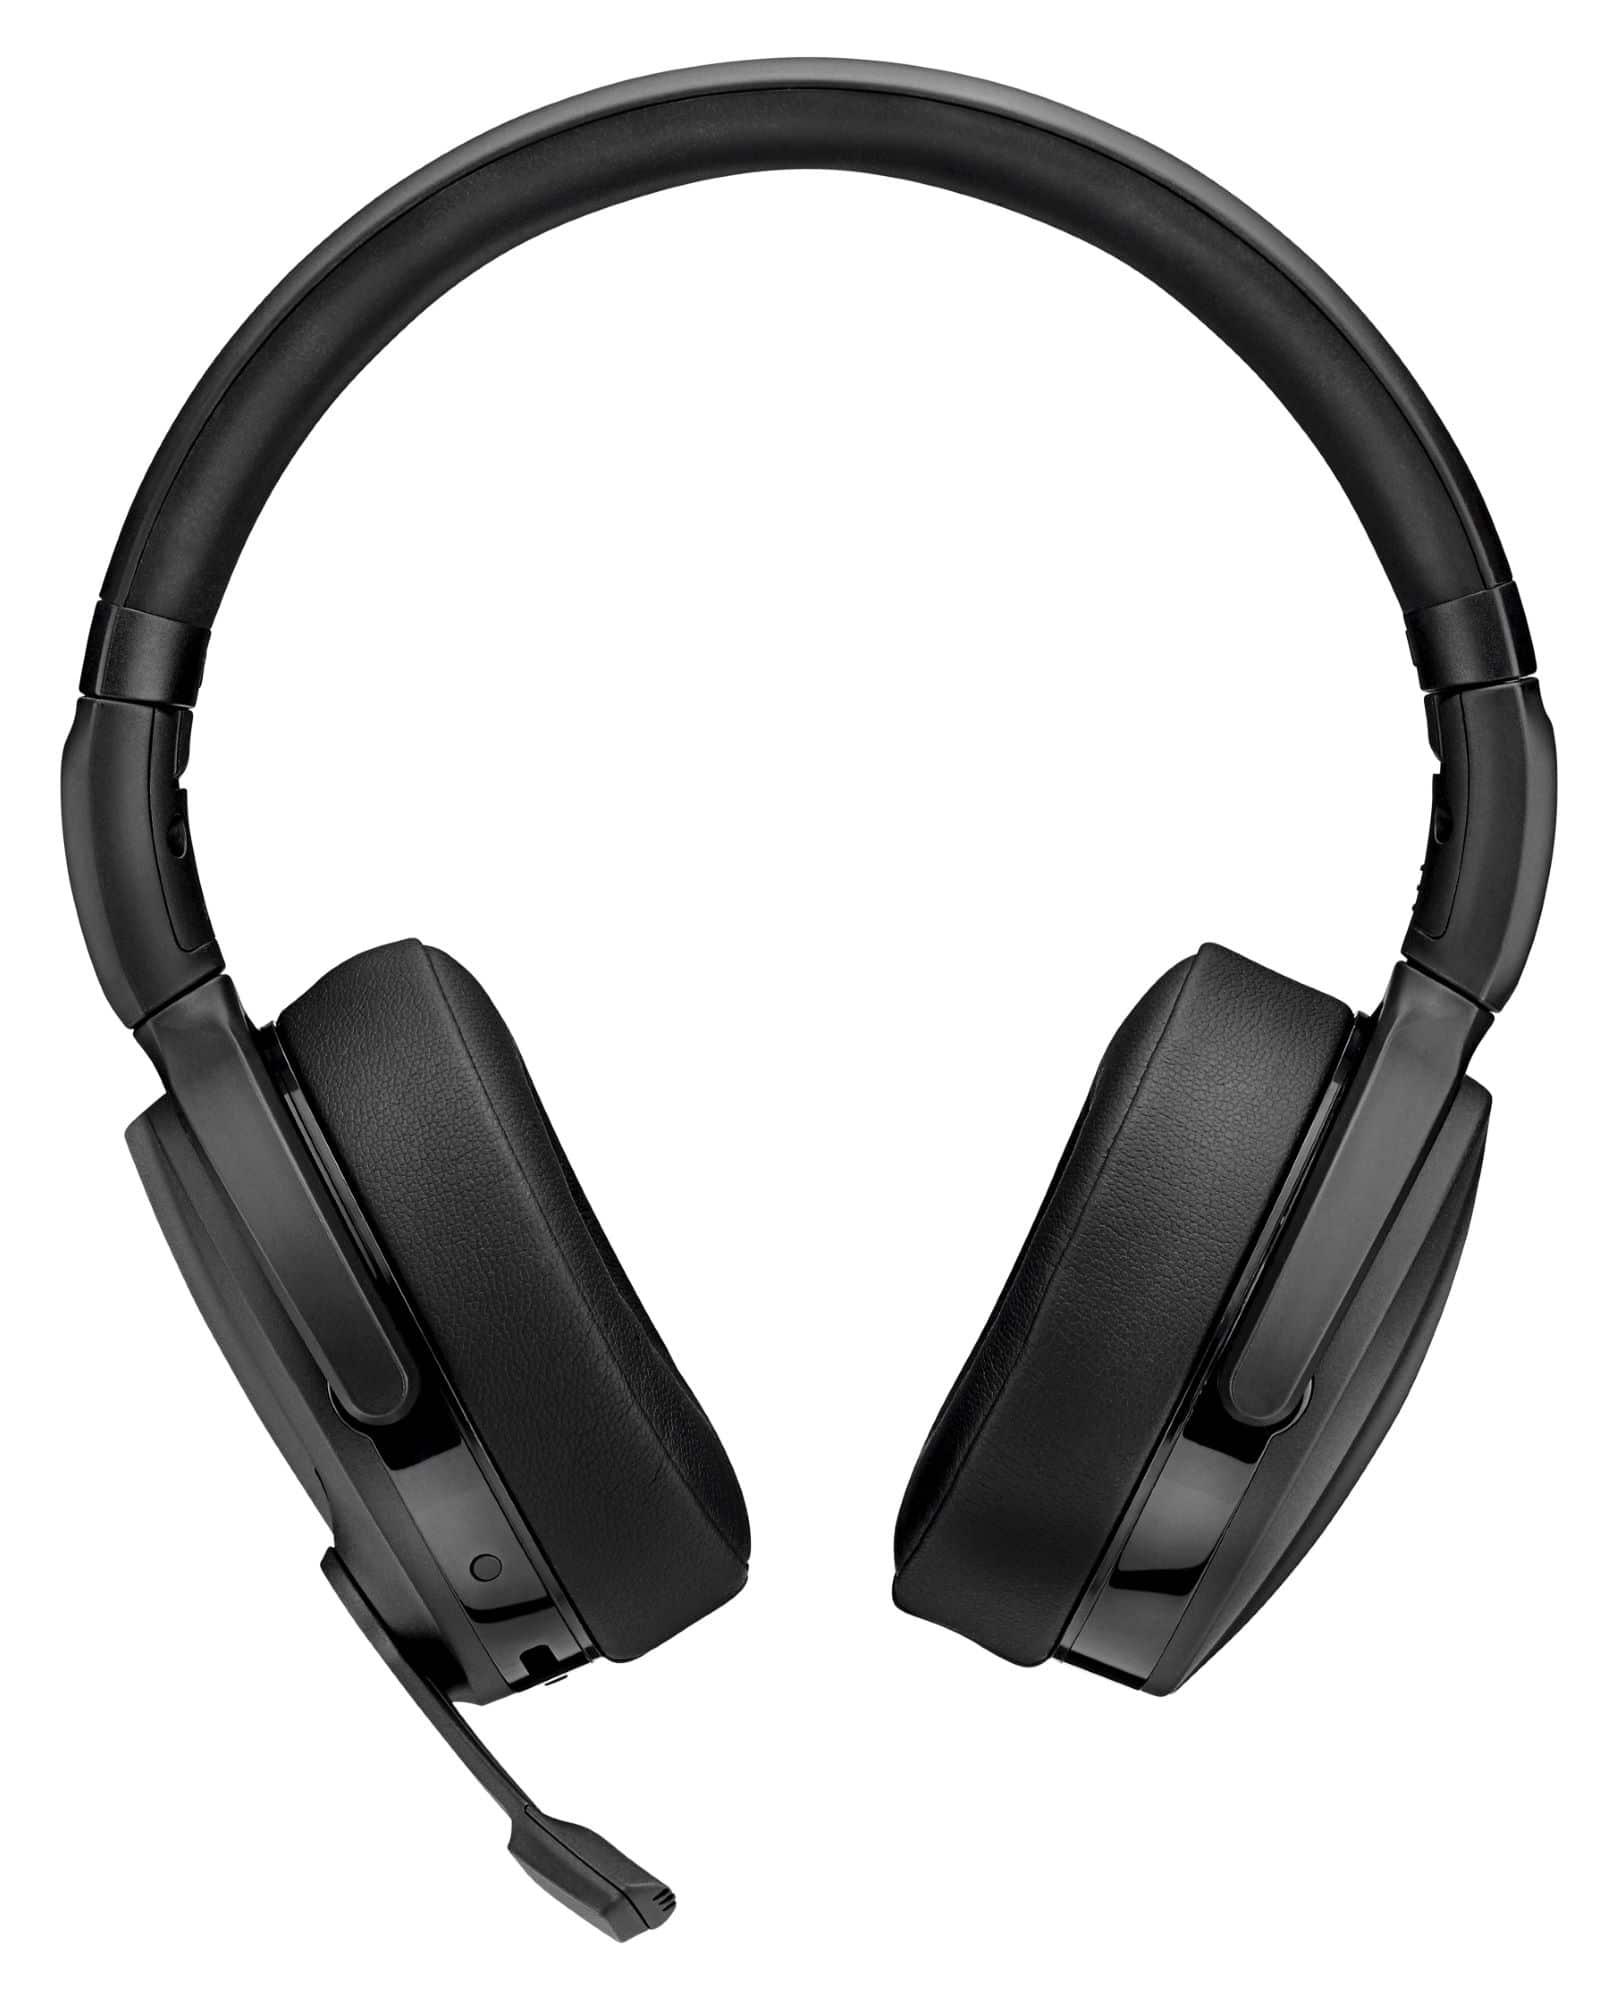 Kopfhoerer - EPOS 560 Noise Cancelling On Ear Bluetooth Headset - Onlineshop Musikhaus Kirstein